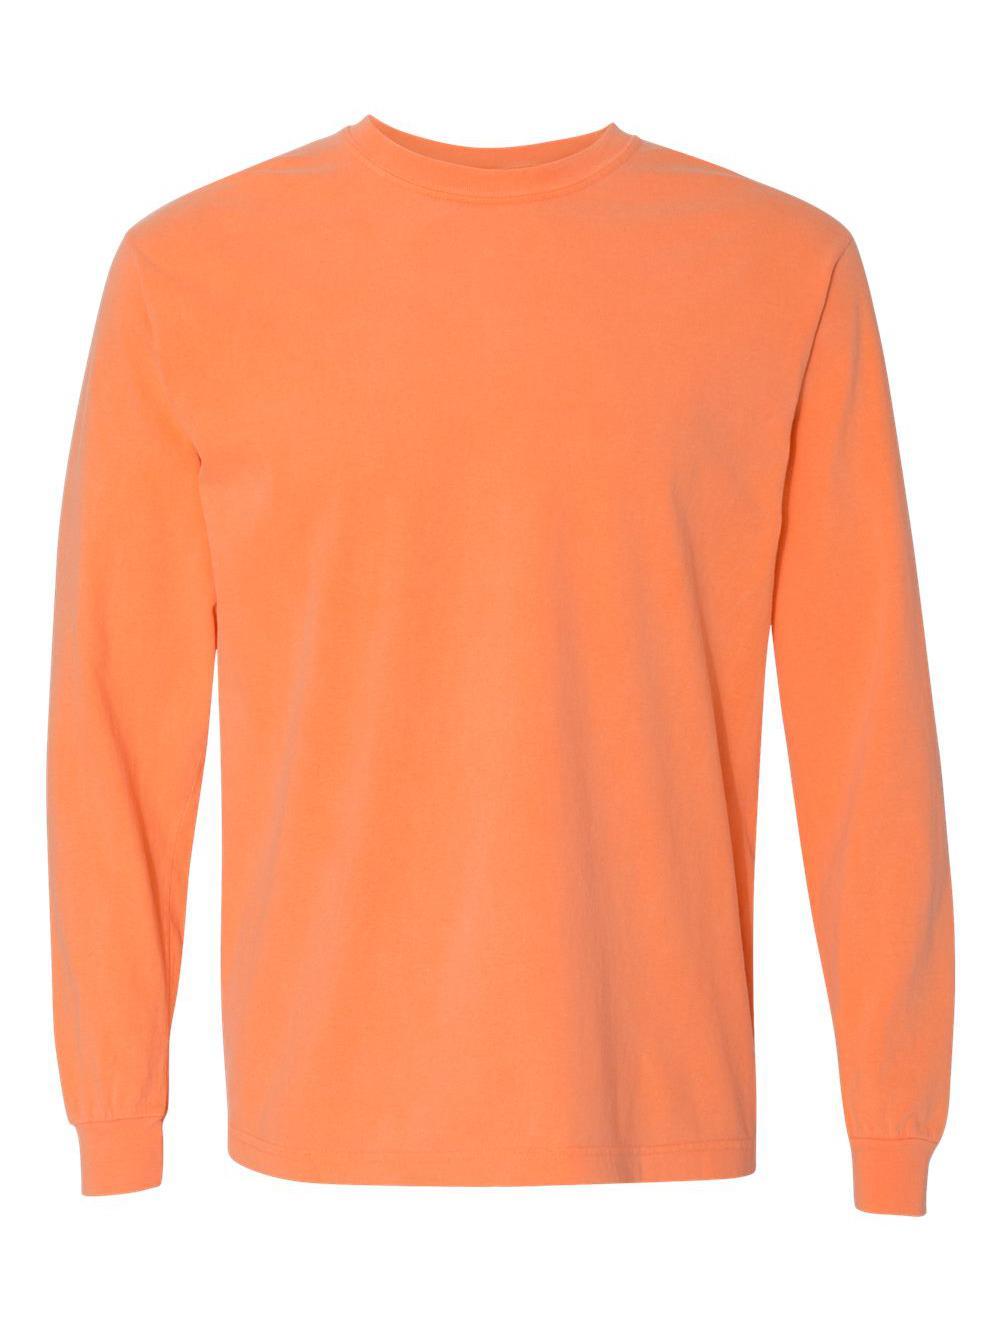 Comfort-Colors-Garment-Dyed-Heavyweight-Ringspun-Long-Sleeve-T-Shirt-6014 thumbnail 48